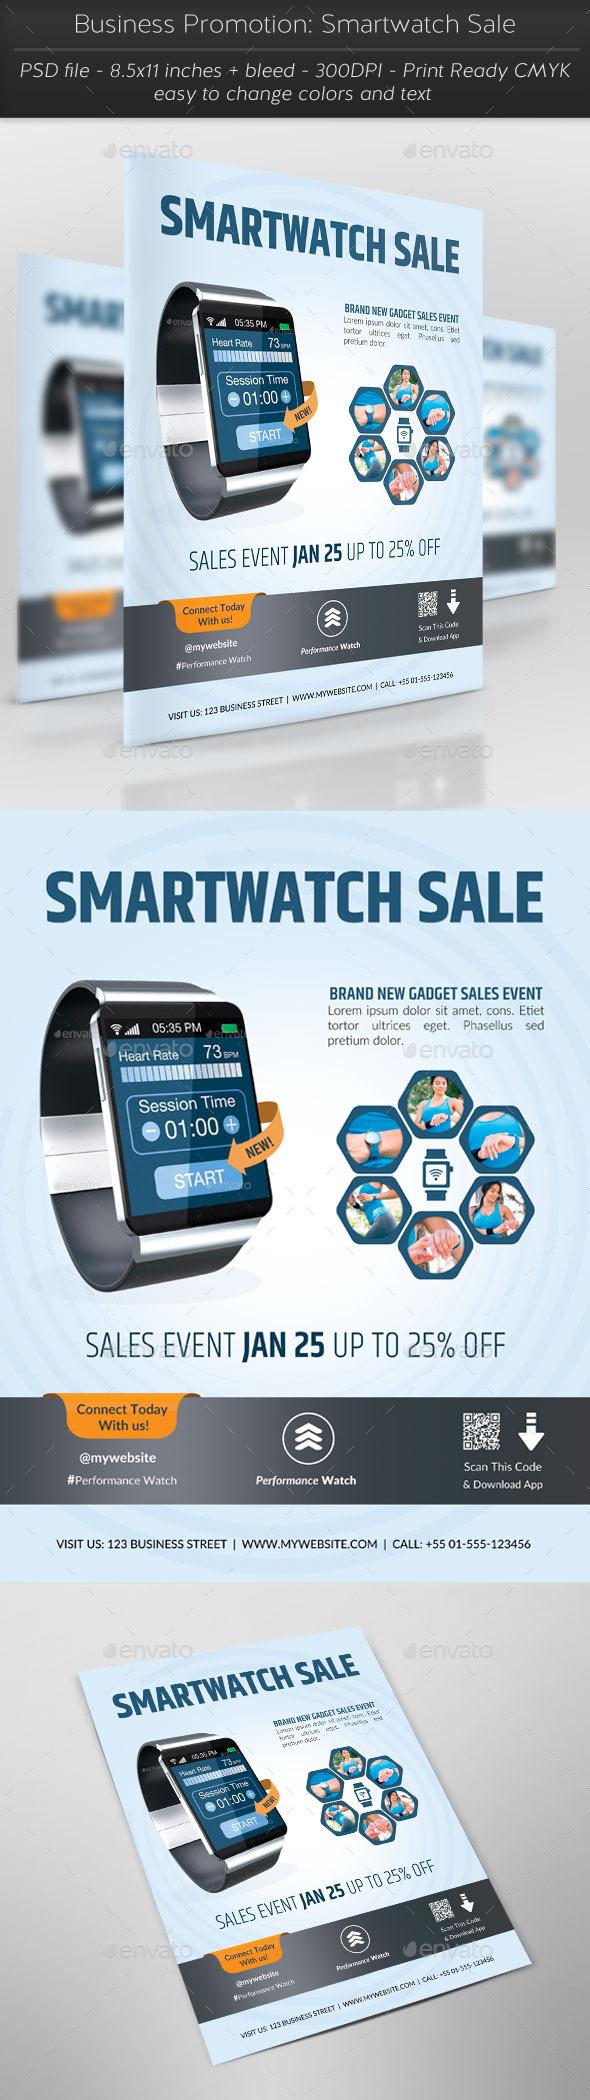 Business Promotion: Smartwatch Sale - Flyers Print Templates